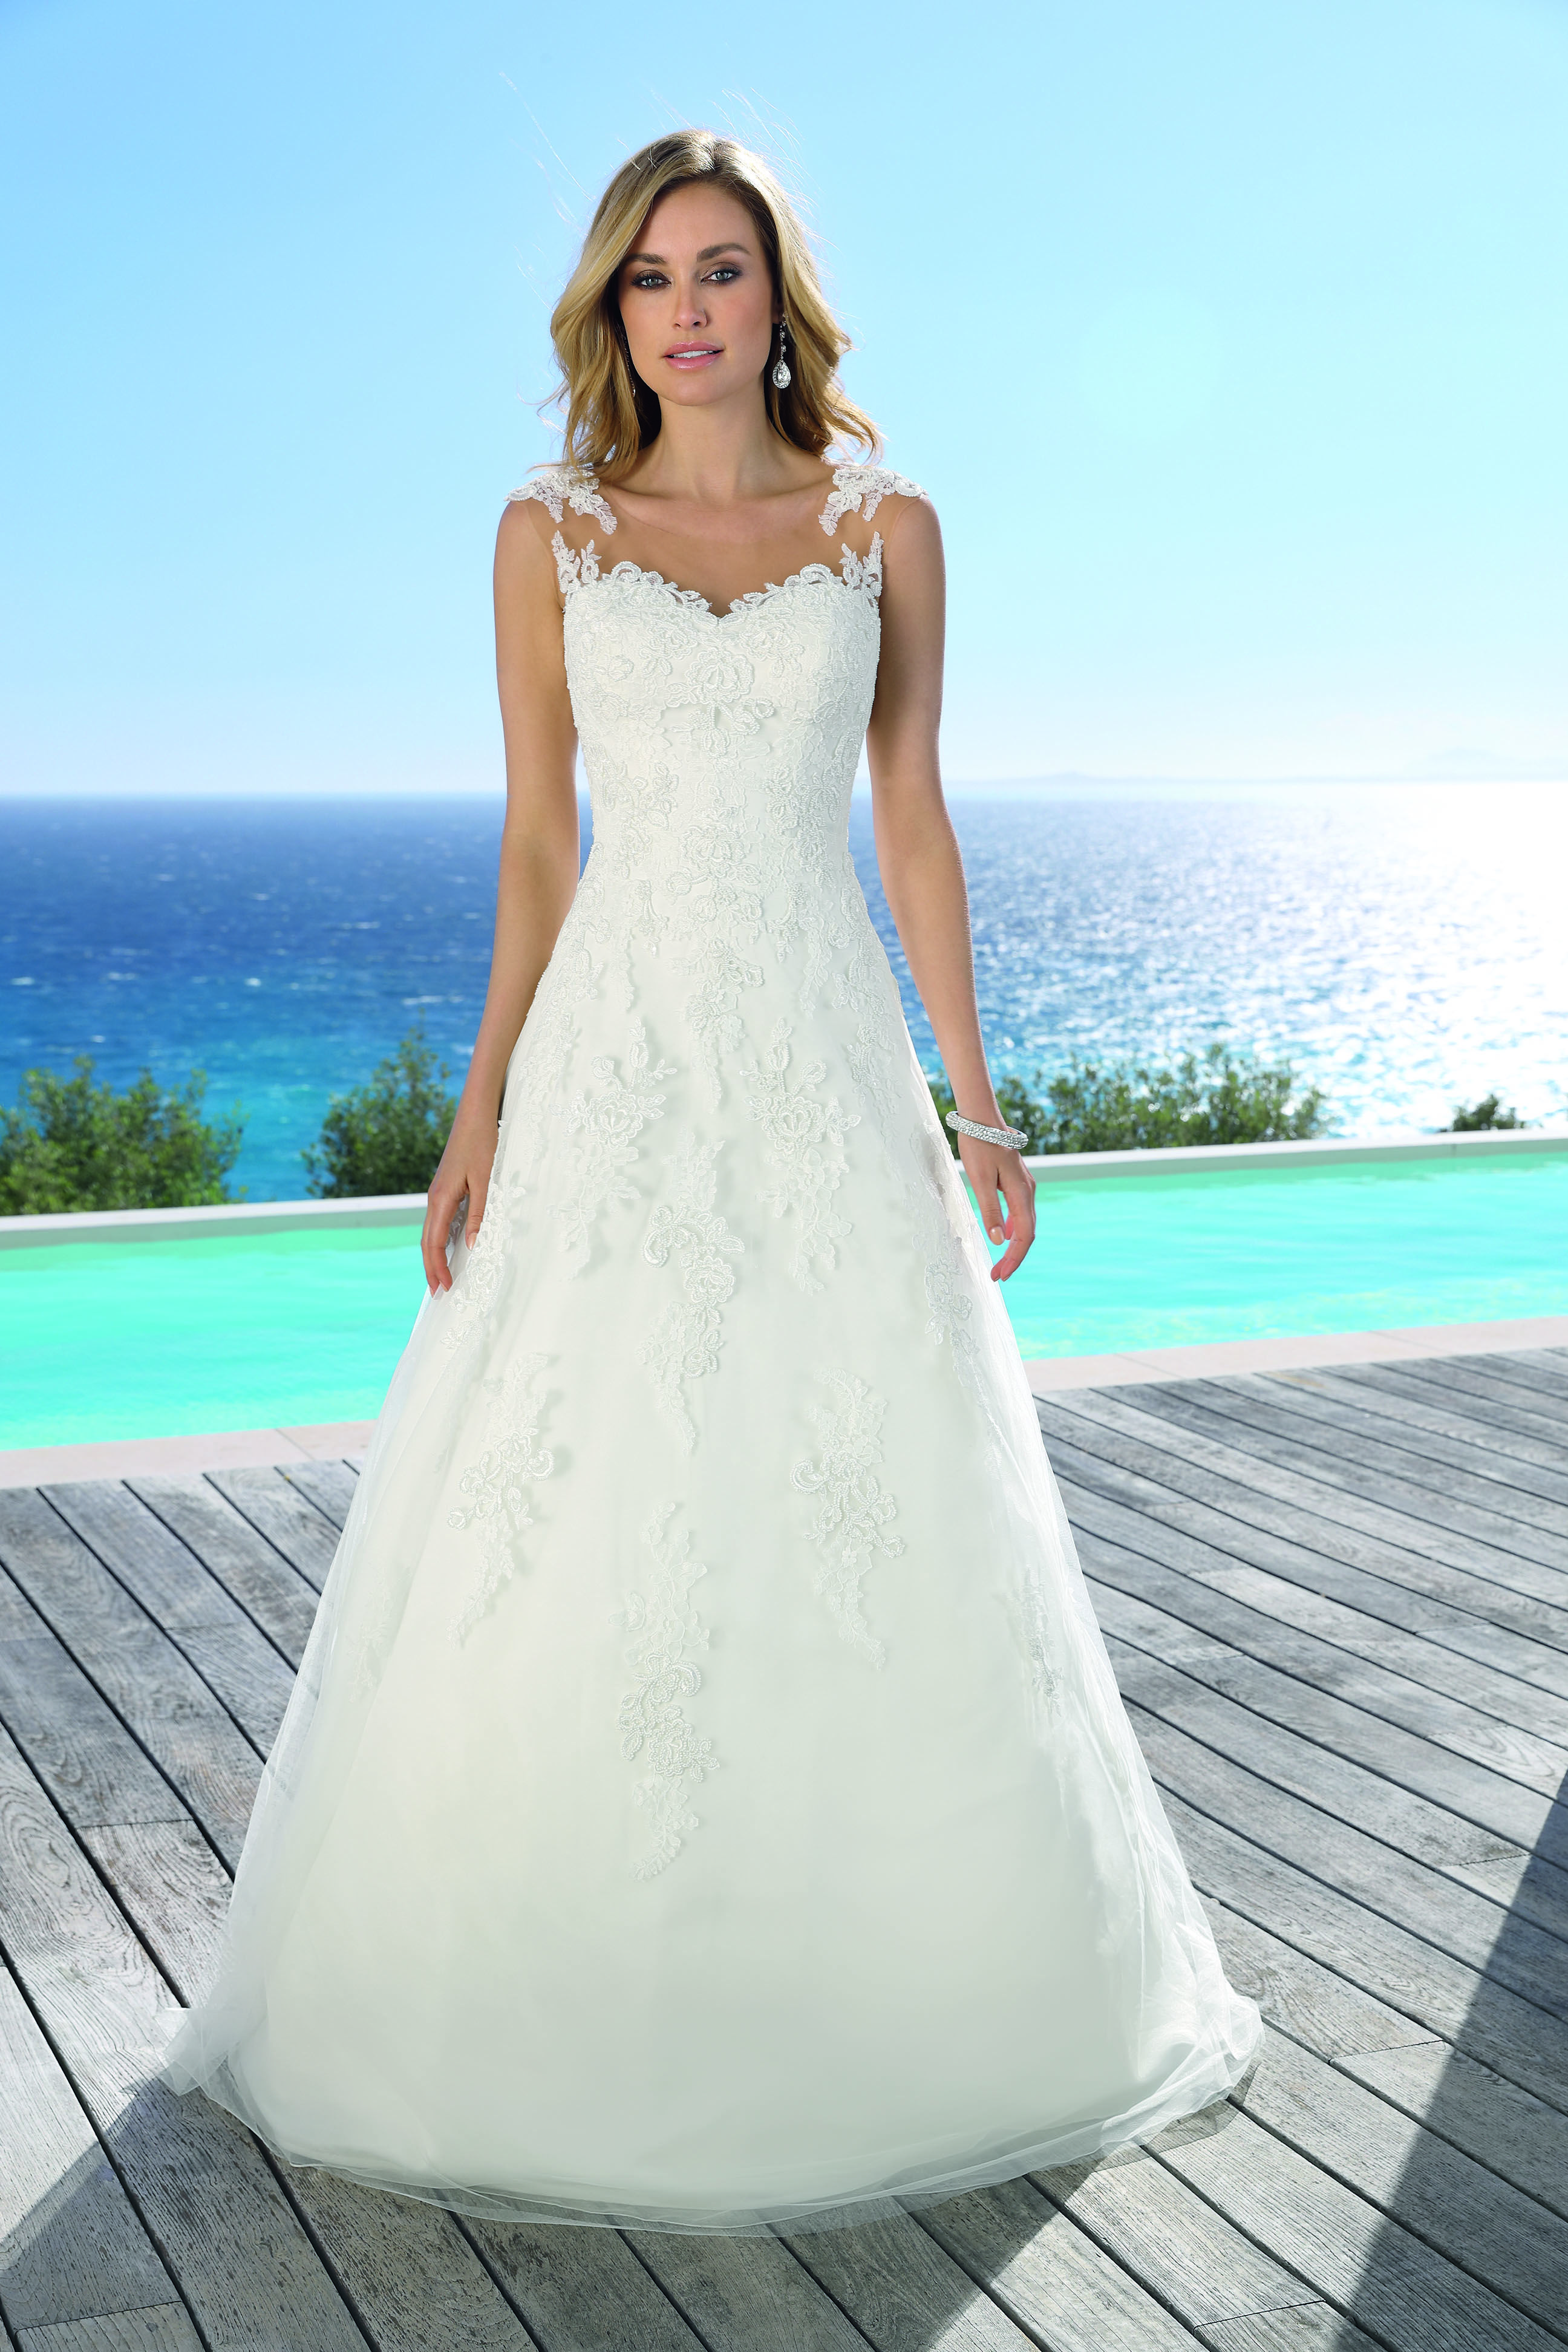 Nice dresses for wedding  Ladybird  Prom dress  Pinterest  Wedding dresses Wedding and Bridal